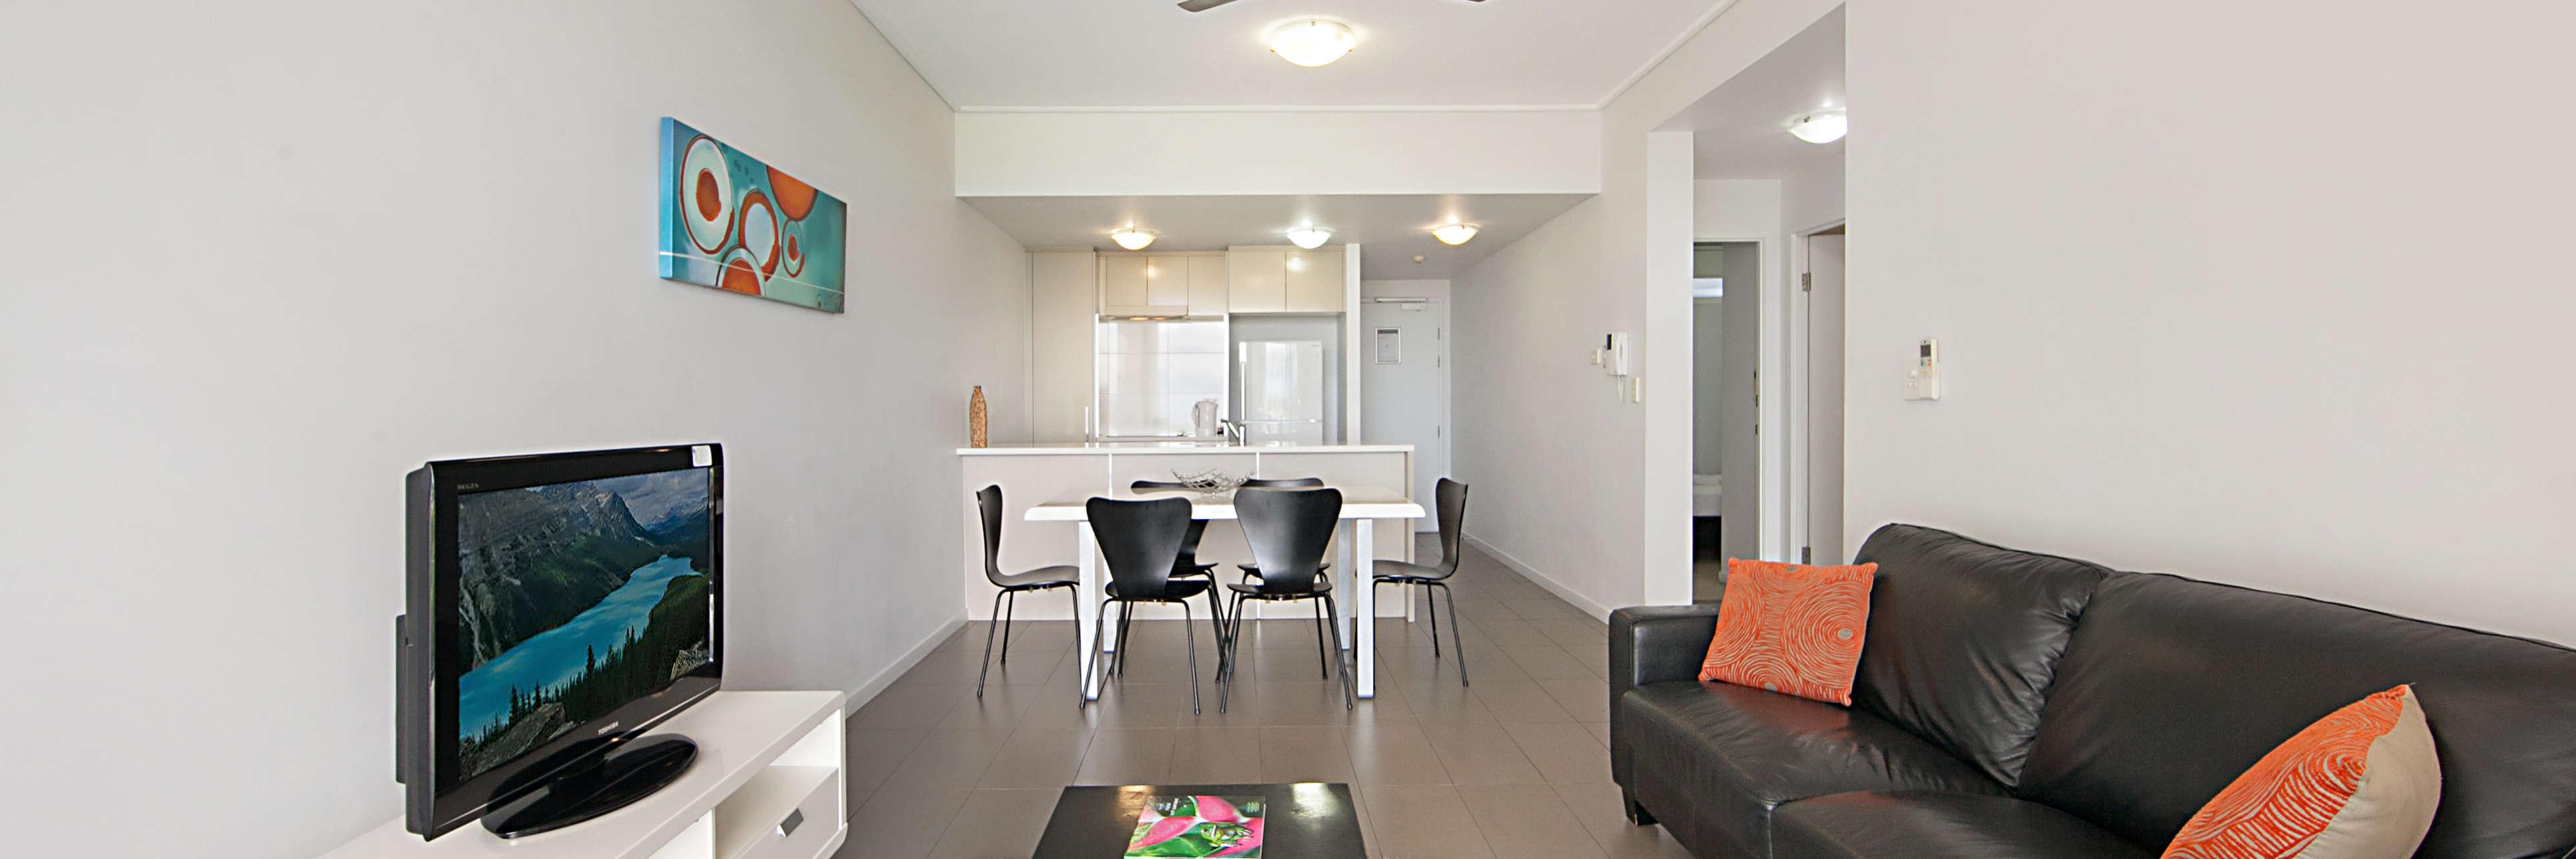 Central Holborn Apartments 58